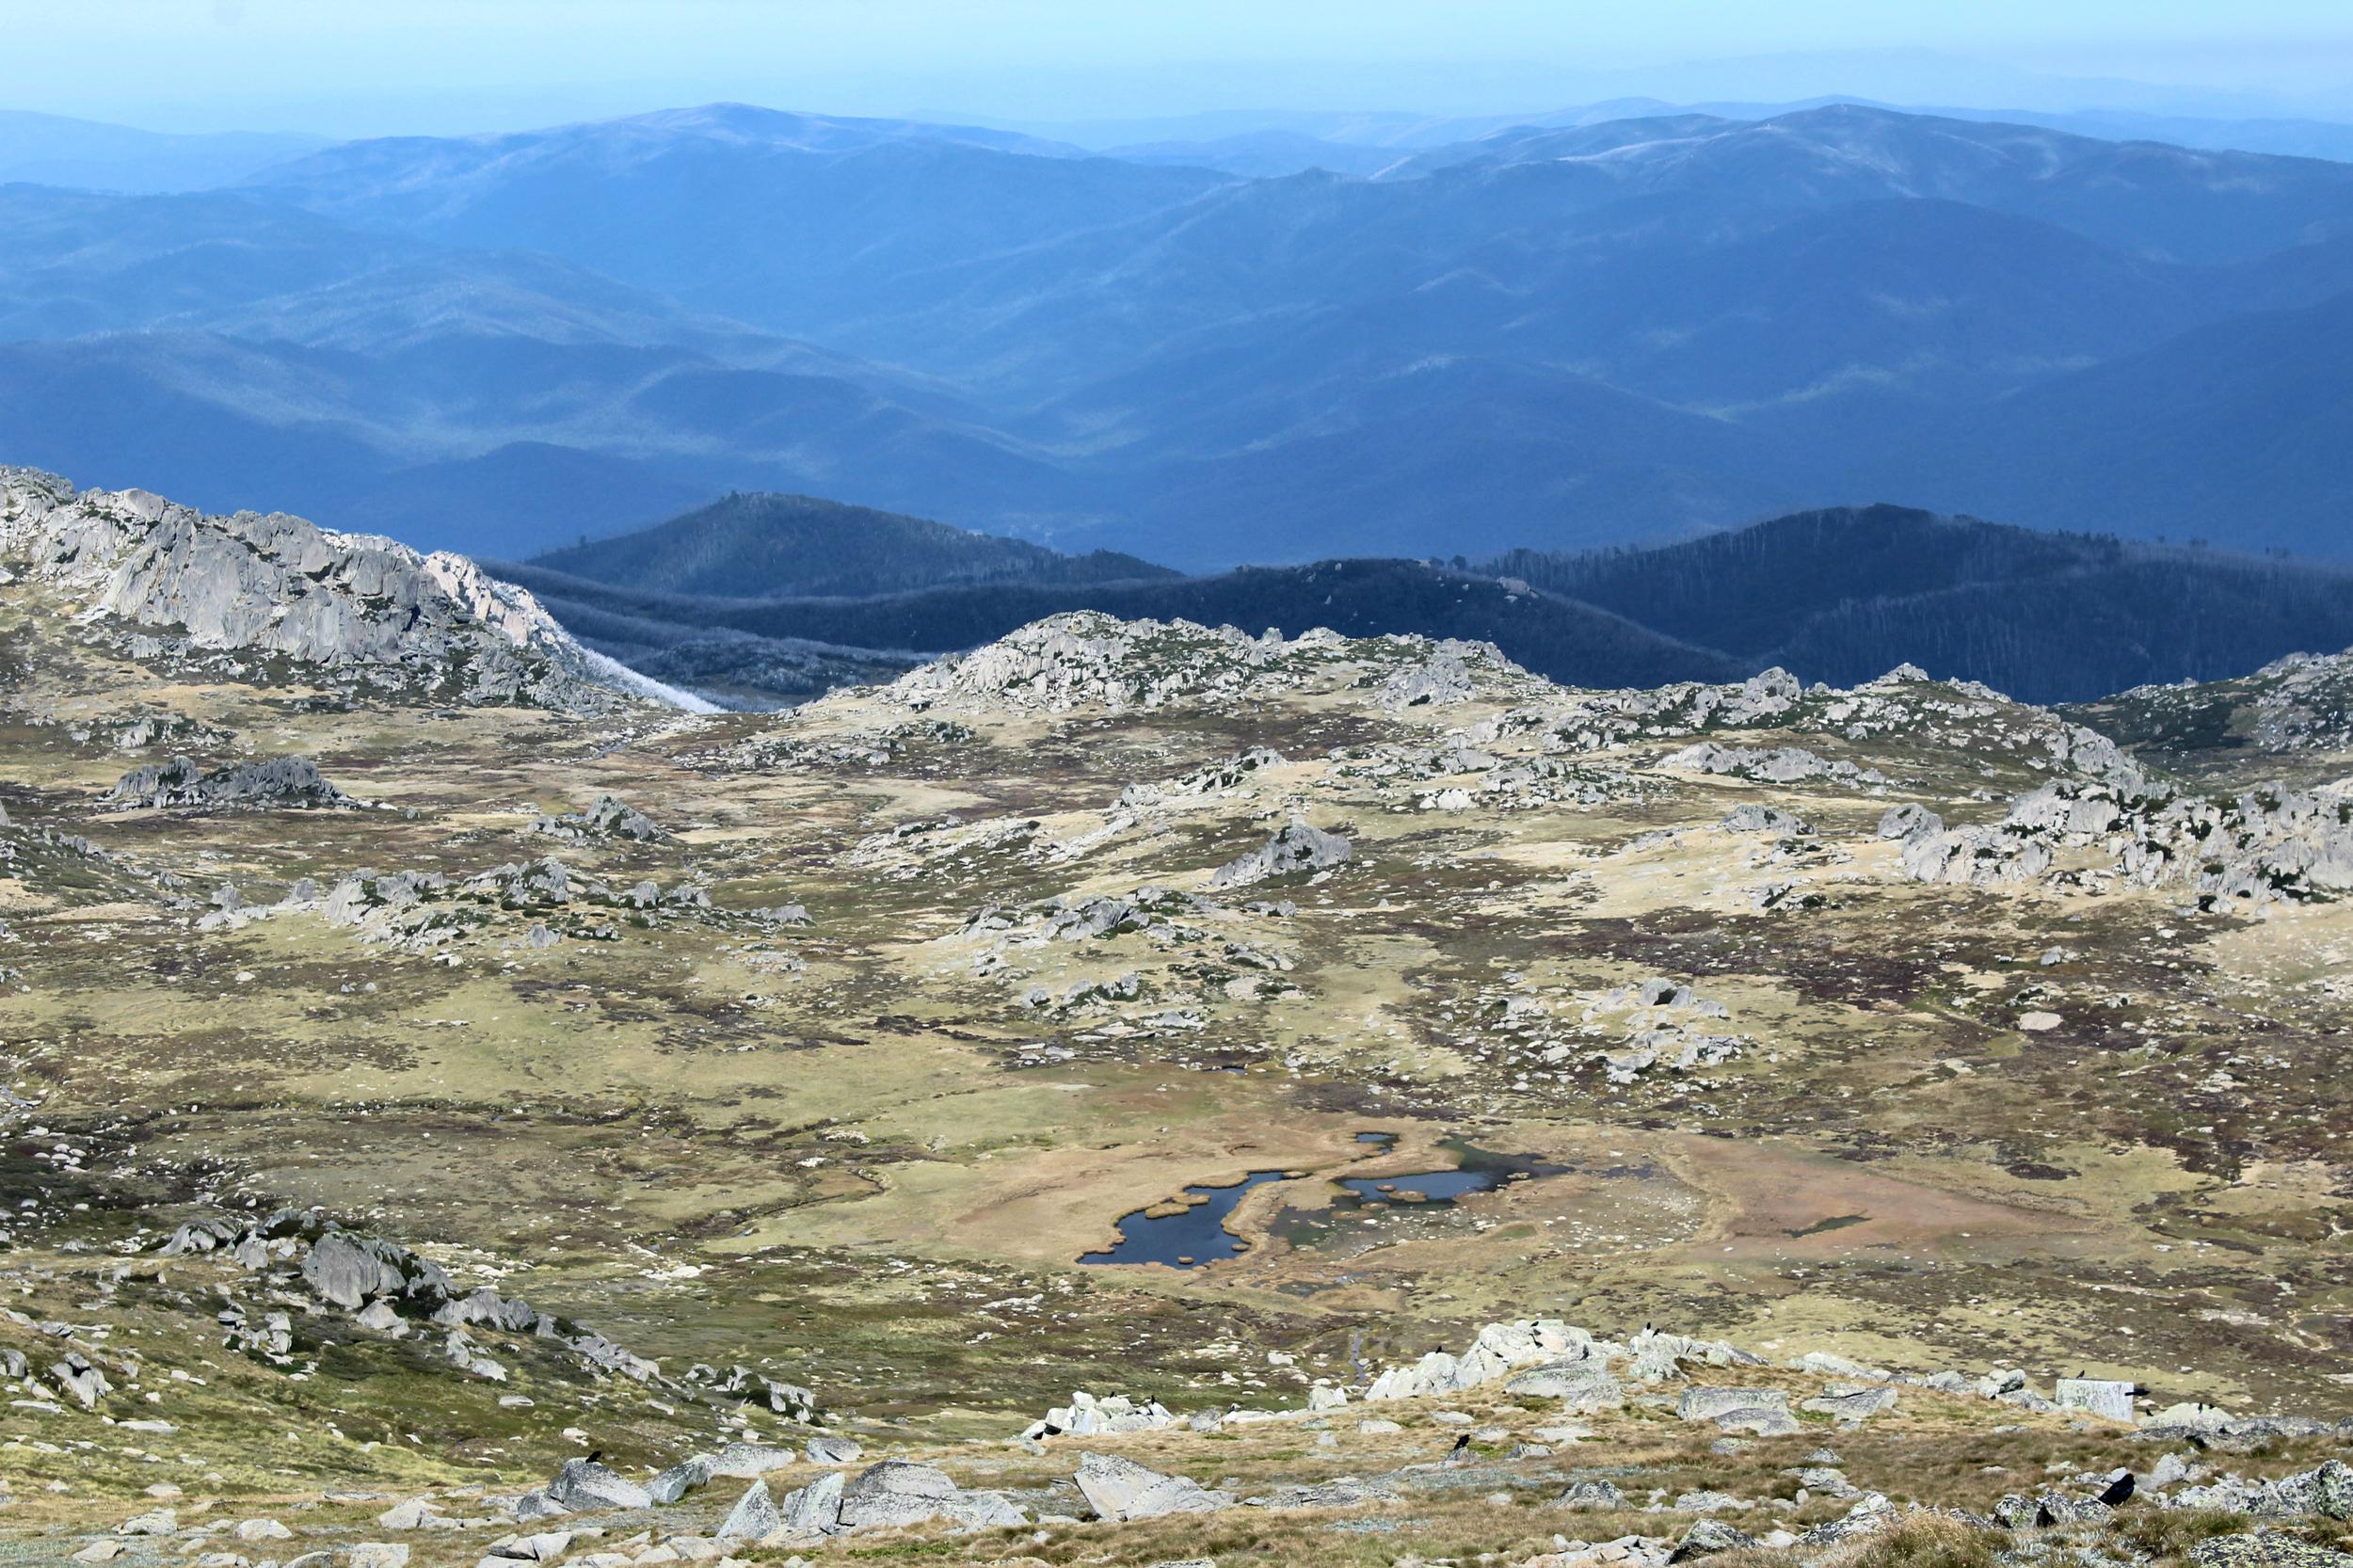 Some views from near the summit,Kosciuszko, Australia – 7,310' (2228m)